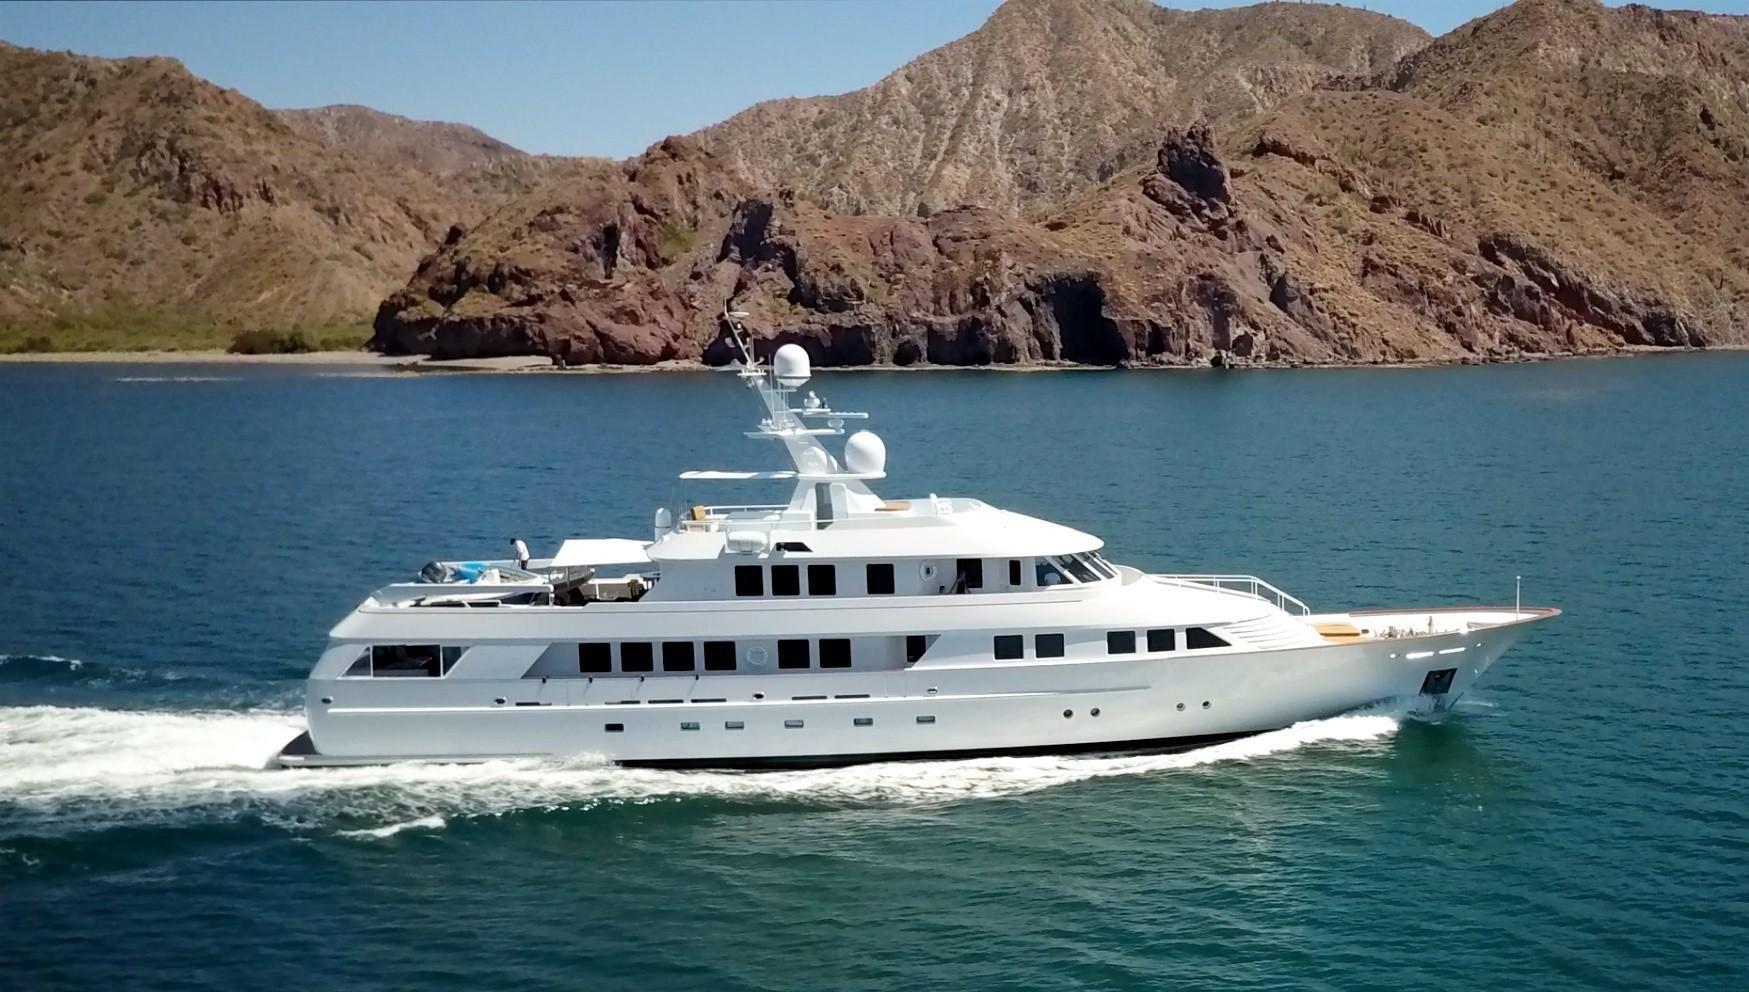 1996 delta marine 150 power boat for sale for Johnson marine italia